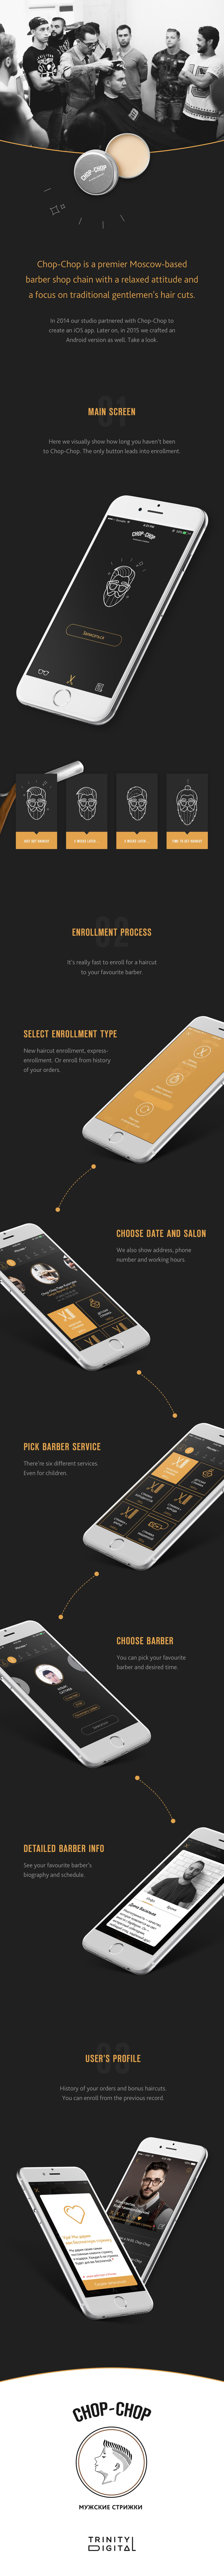 android ios UI ux interaction visual barber haircut Fashion  ILLUSTRATION